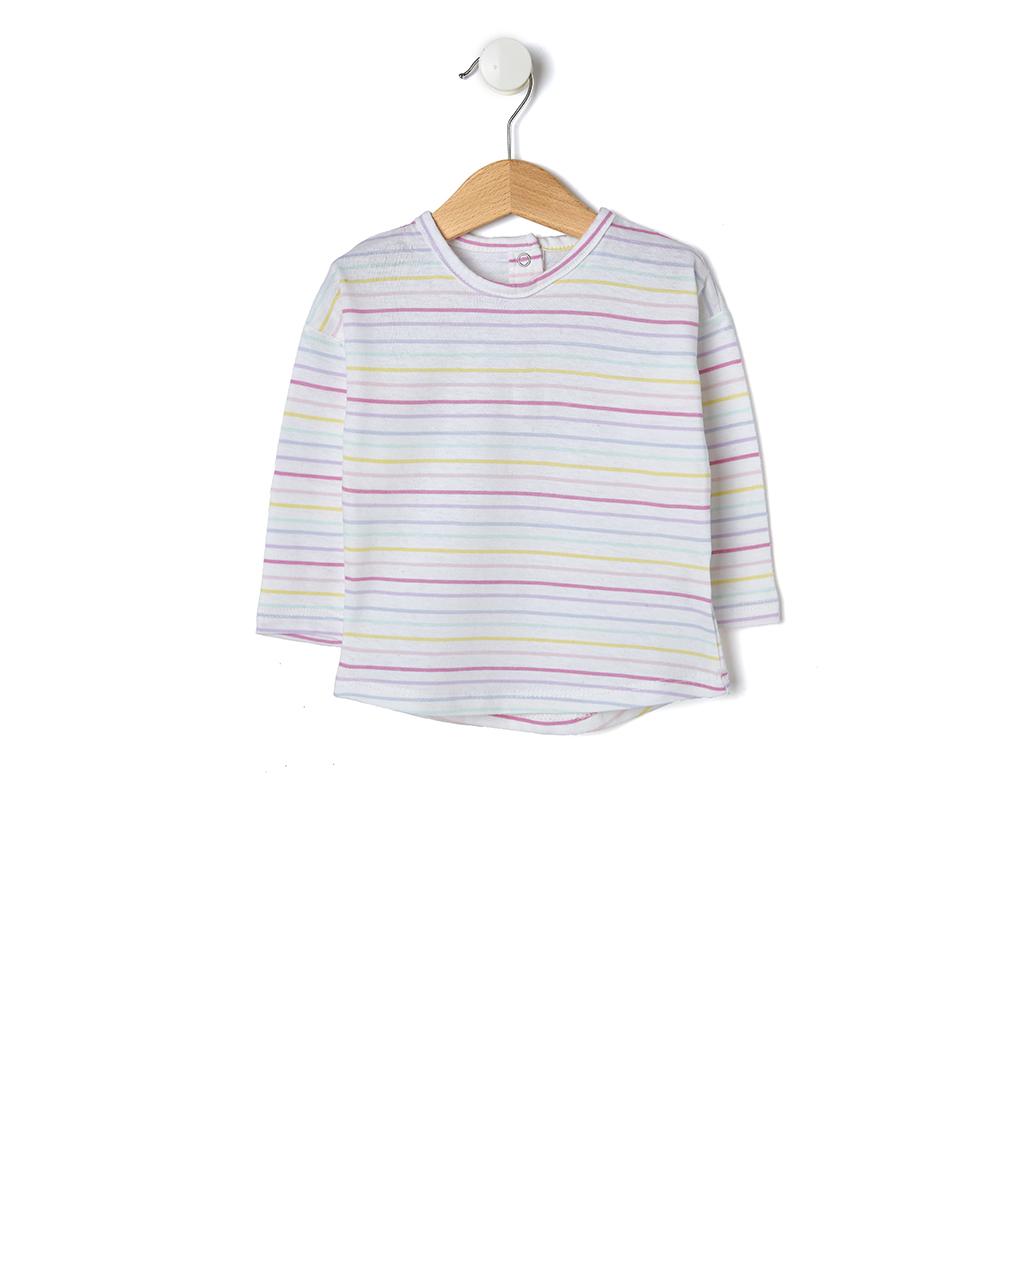 T-shirt Basic Ριγέ Πολύχρωμο για Κορίτσι